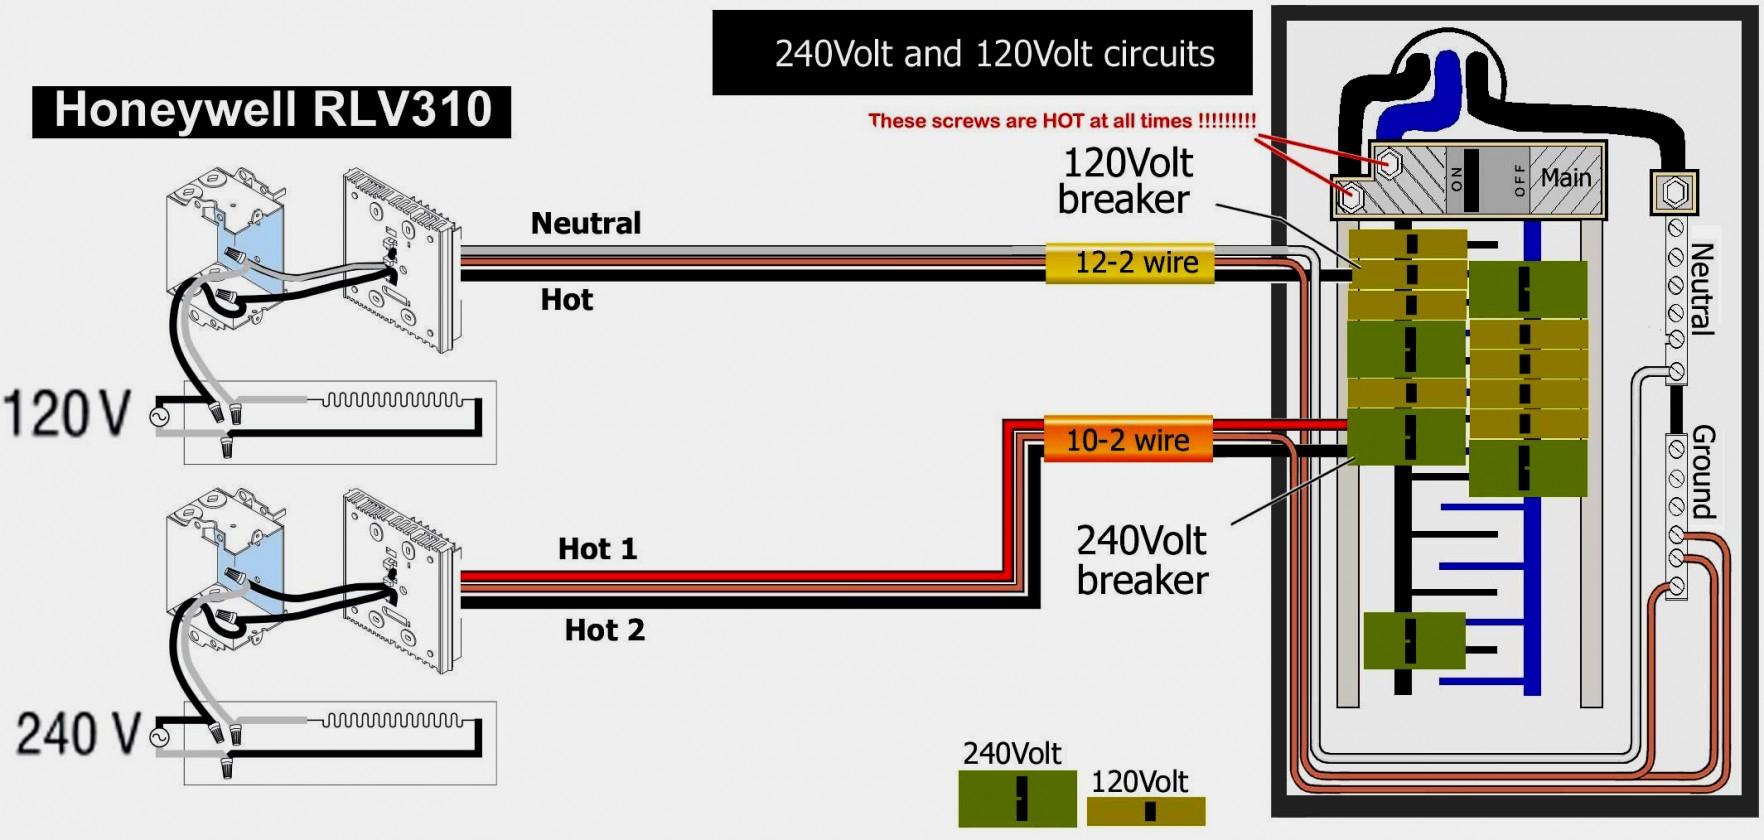 240V Heater Wiring Diagram | Wiring Diagram - 240 Volt Heater Wiring Diagram